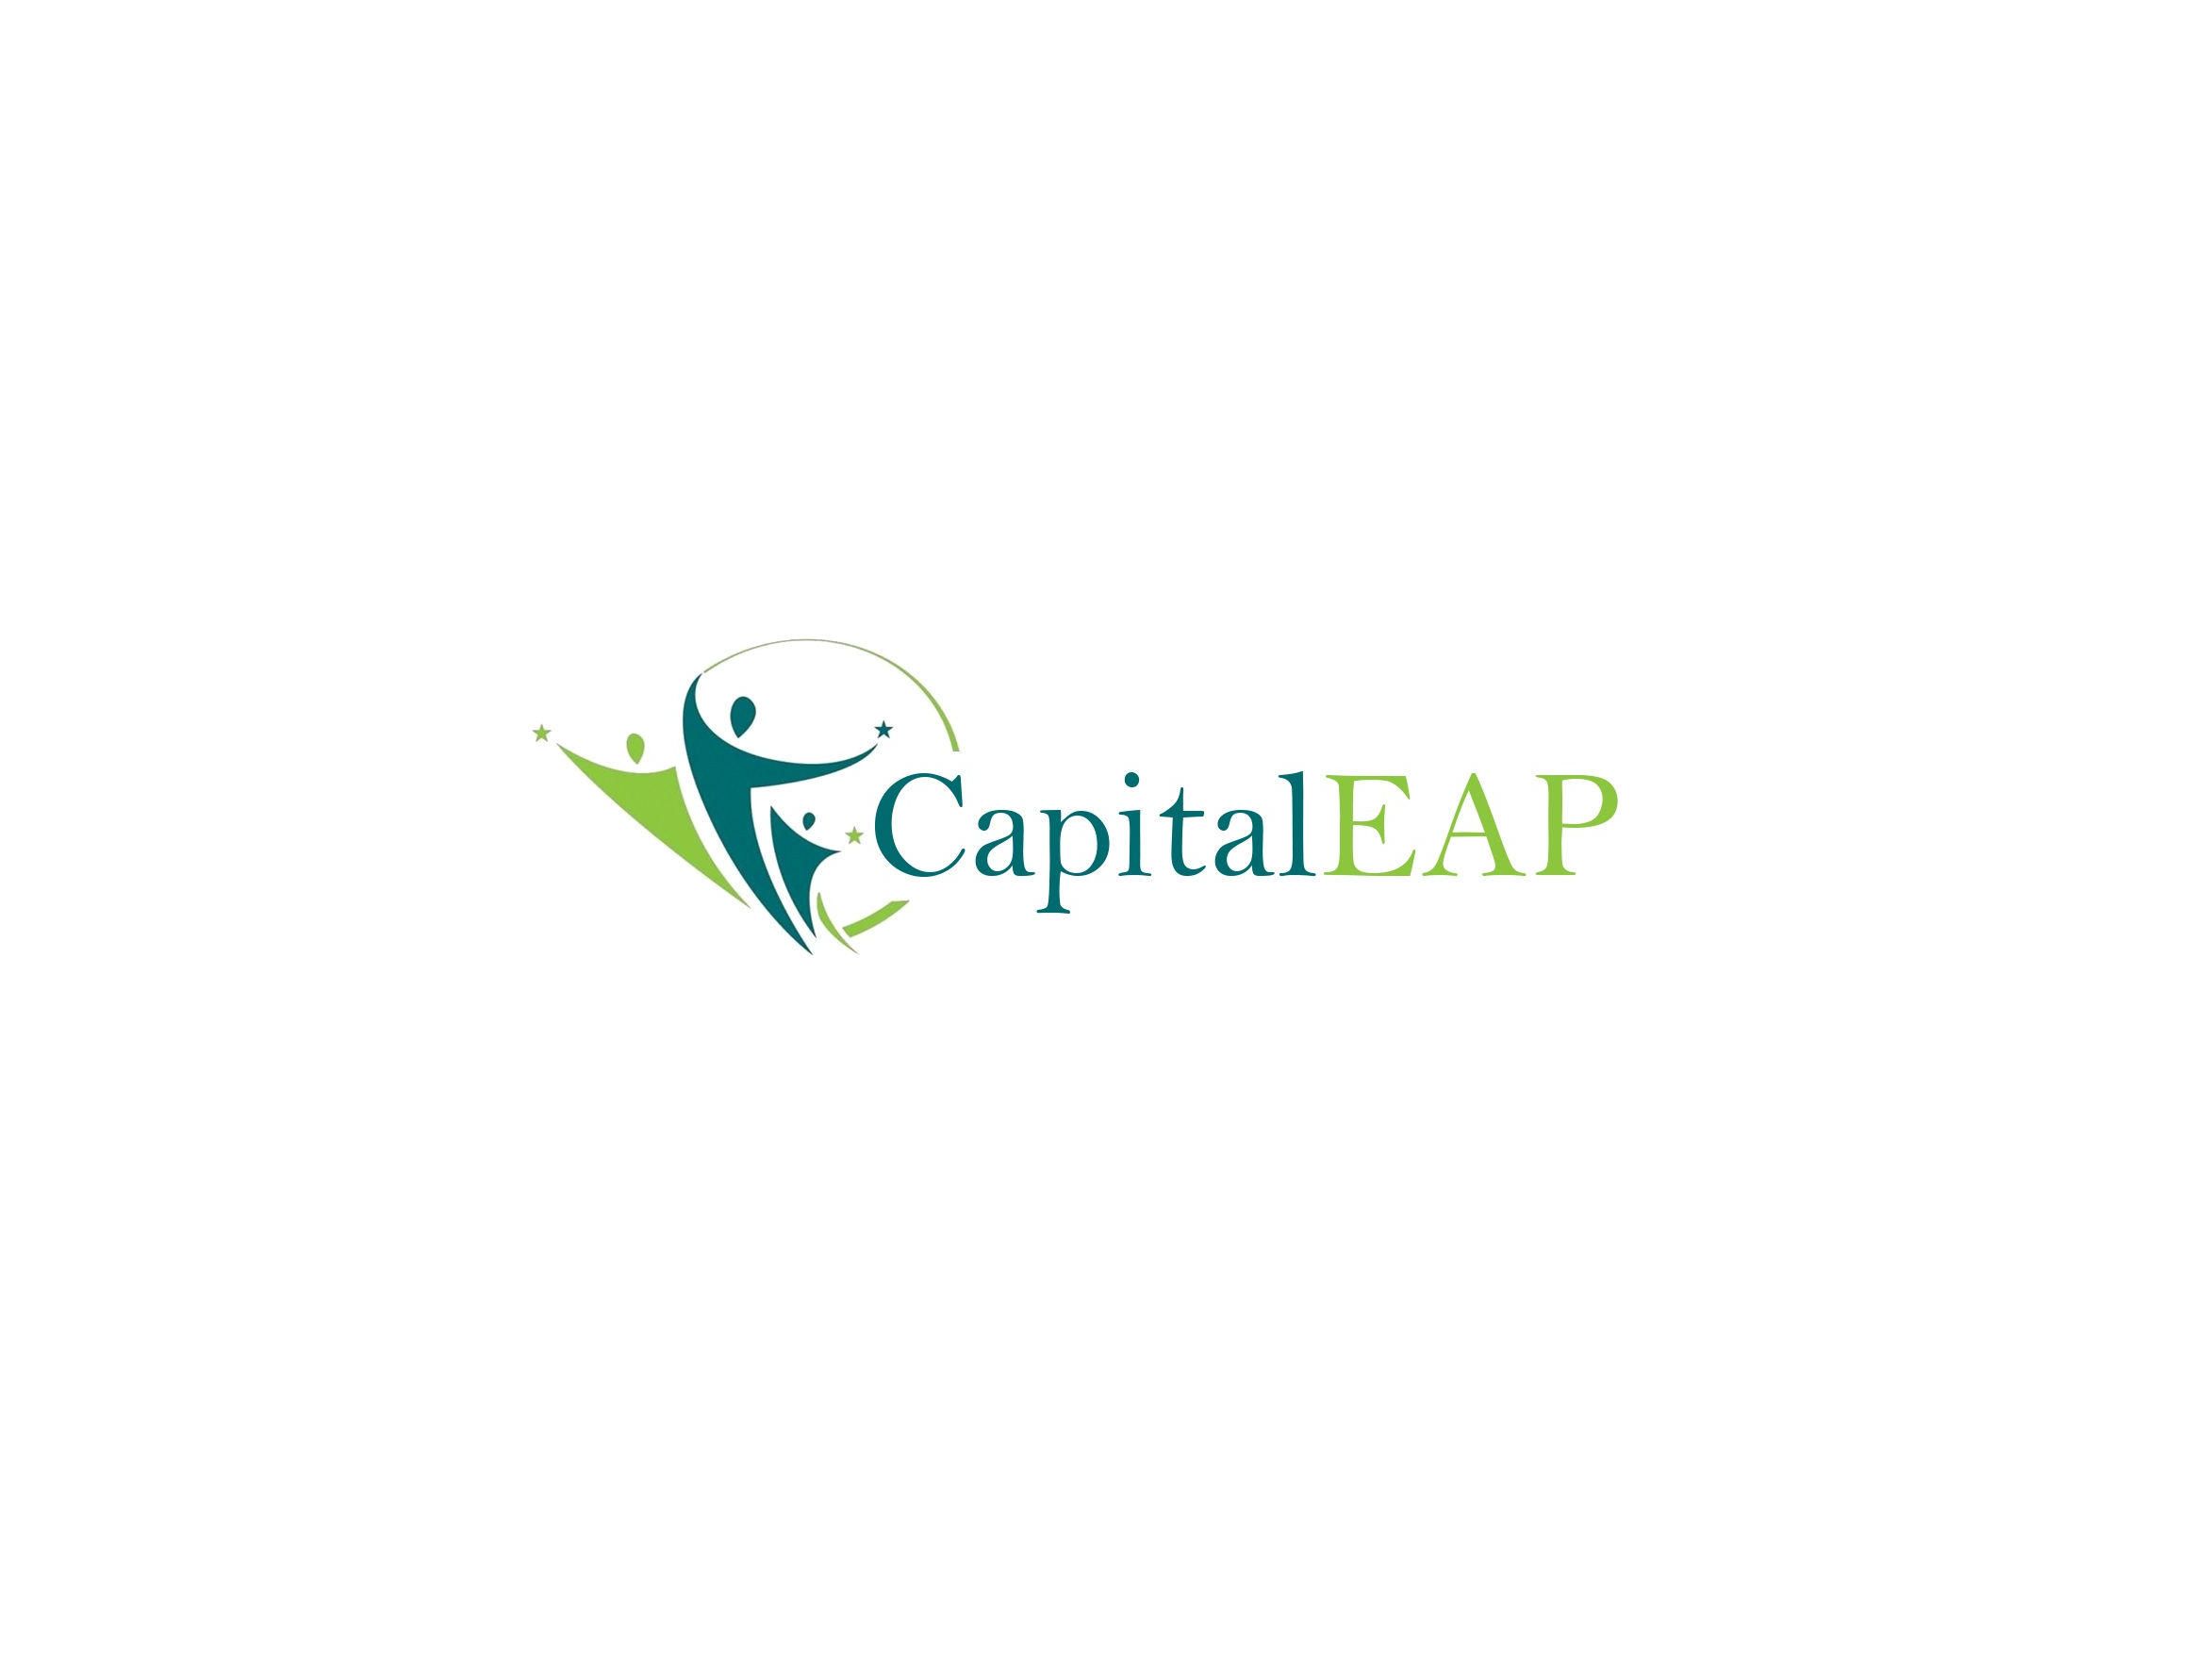 Capital EAP logo